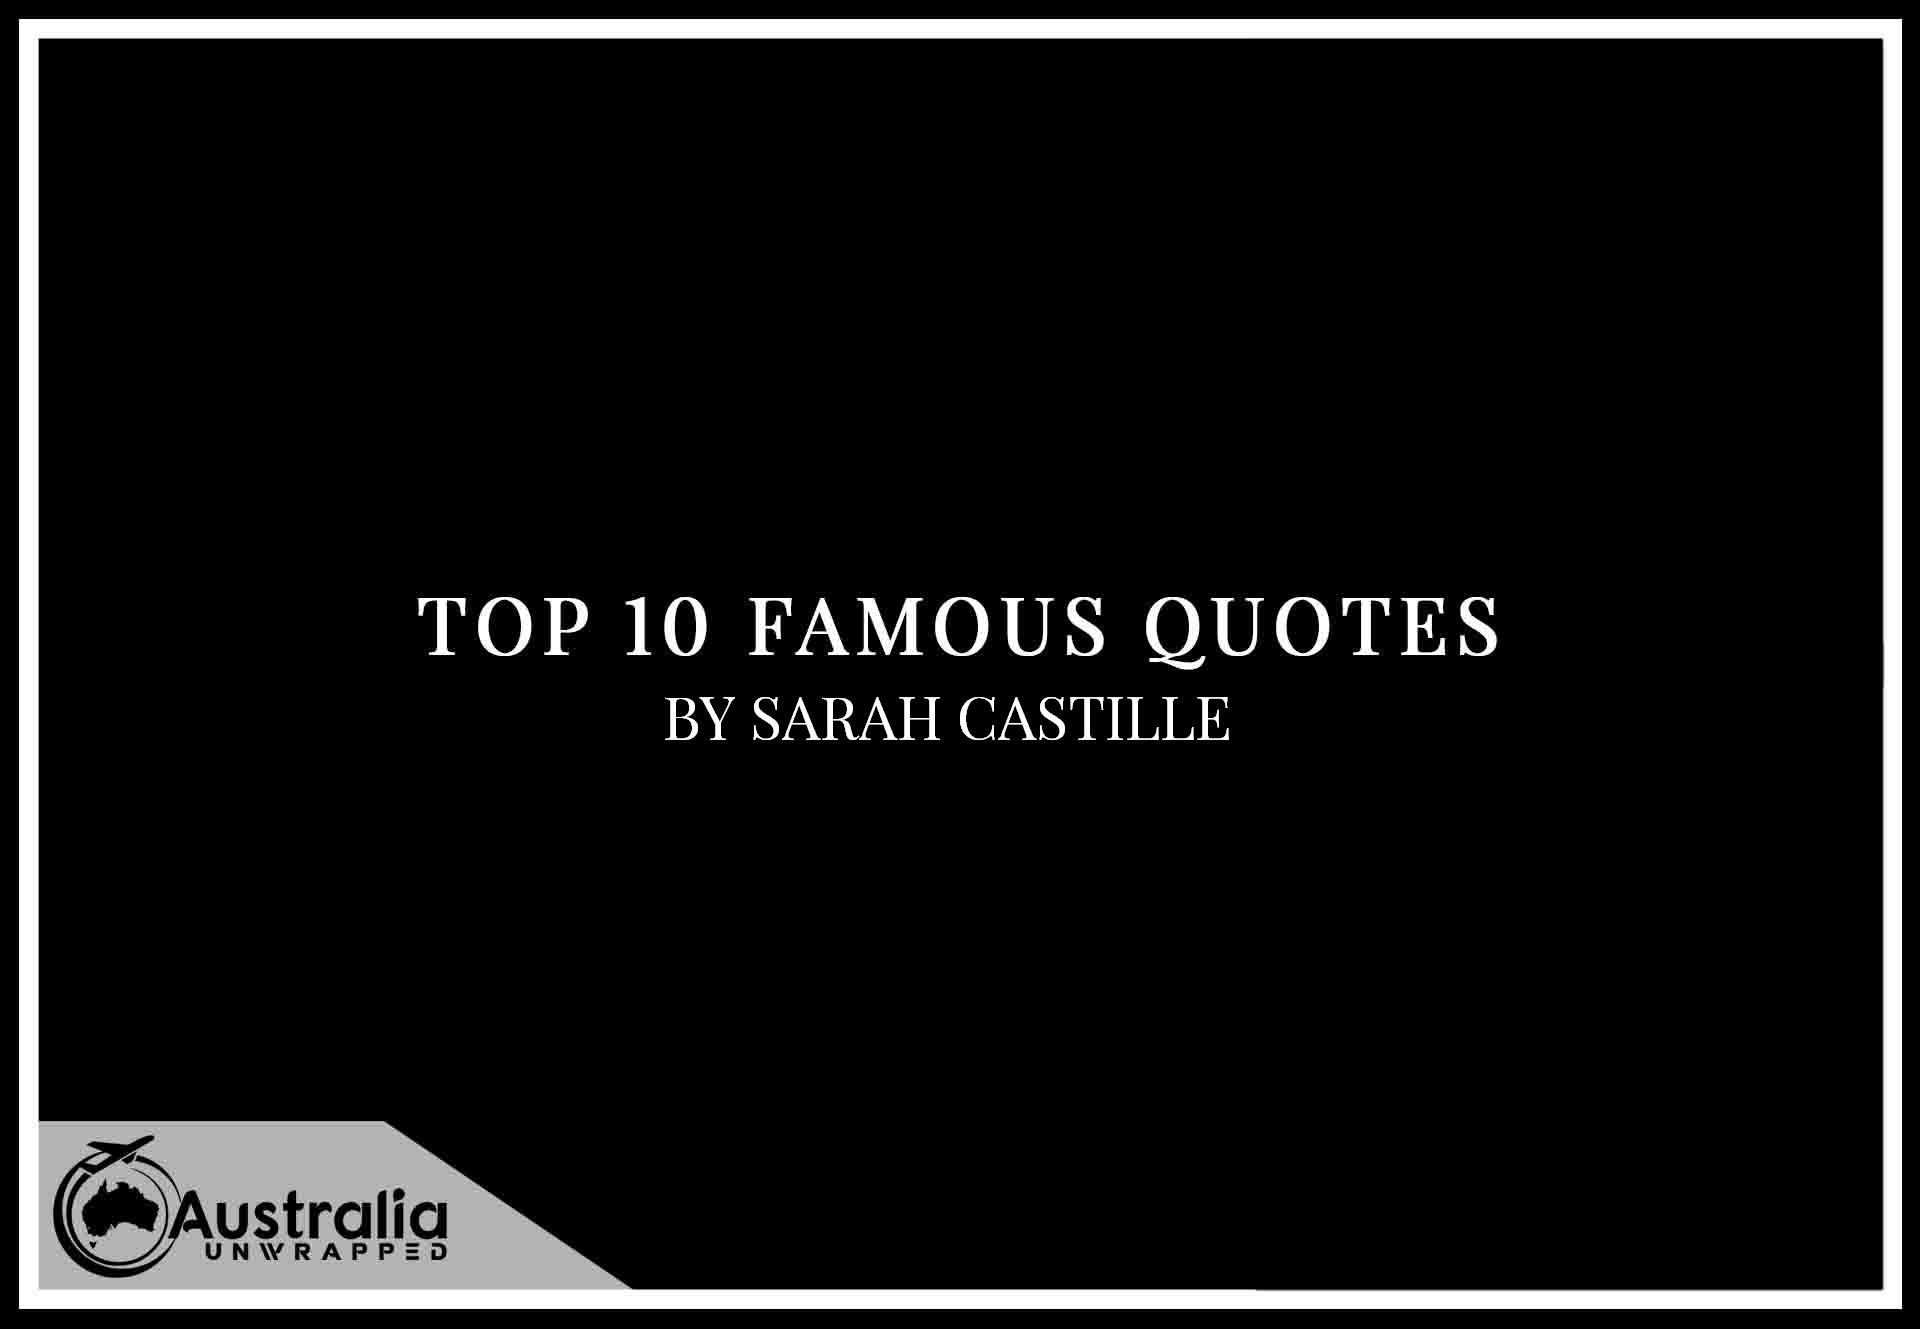 Top 10 Famous Quotes by Author Sarah Castille